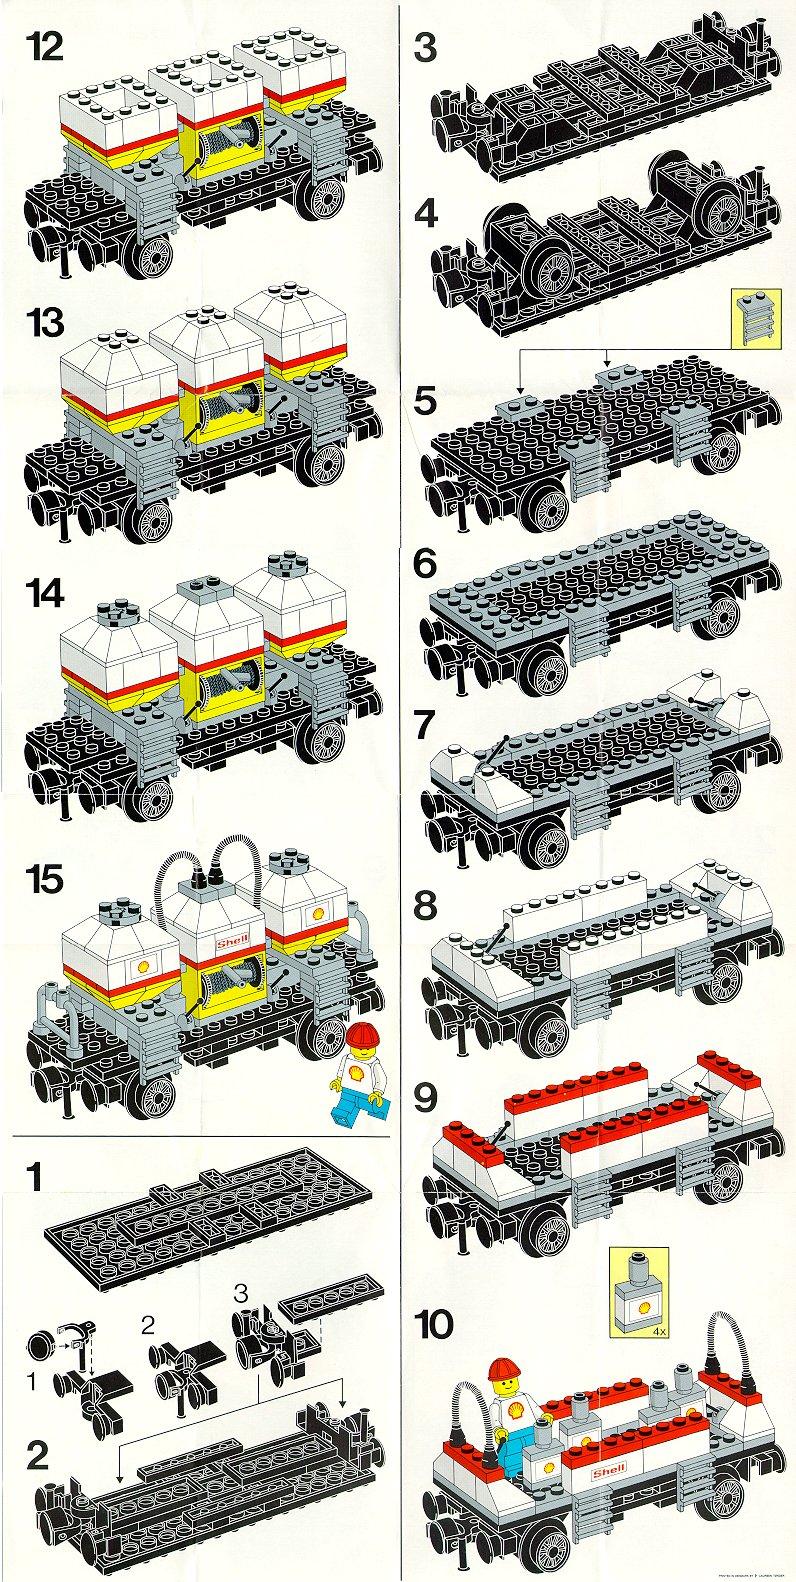 Lego Train Station Moc Instructions